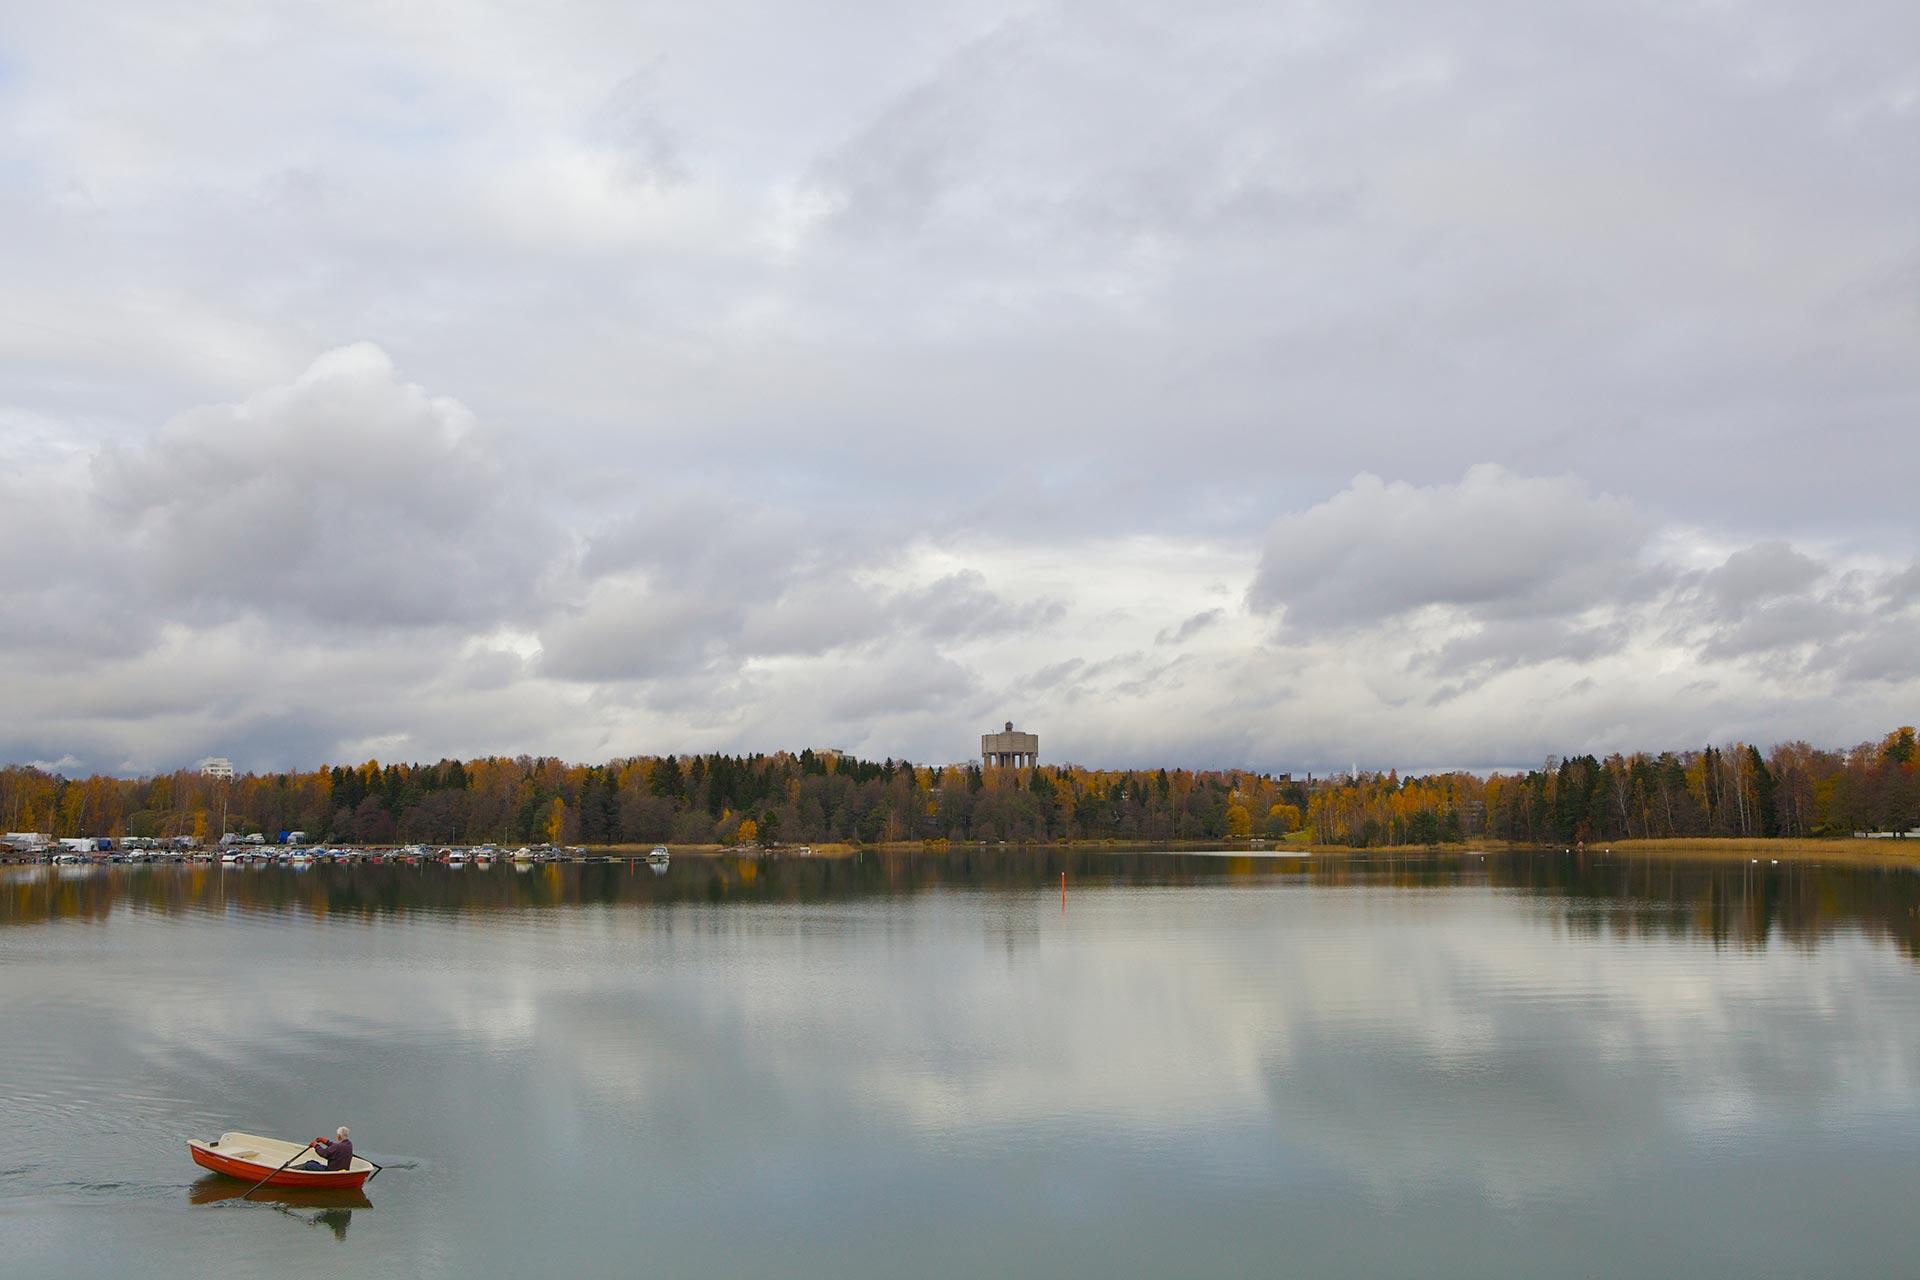 Otsolahden venesatama © Visit Espoo